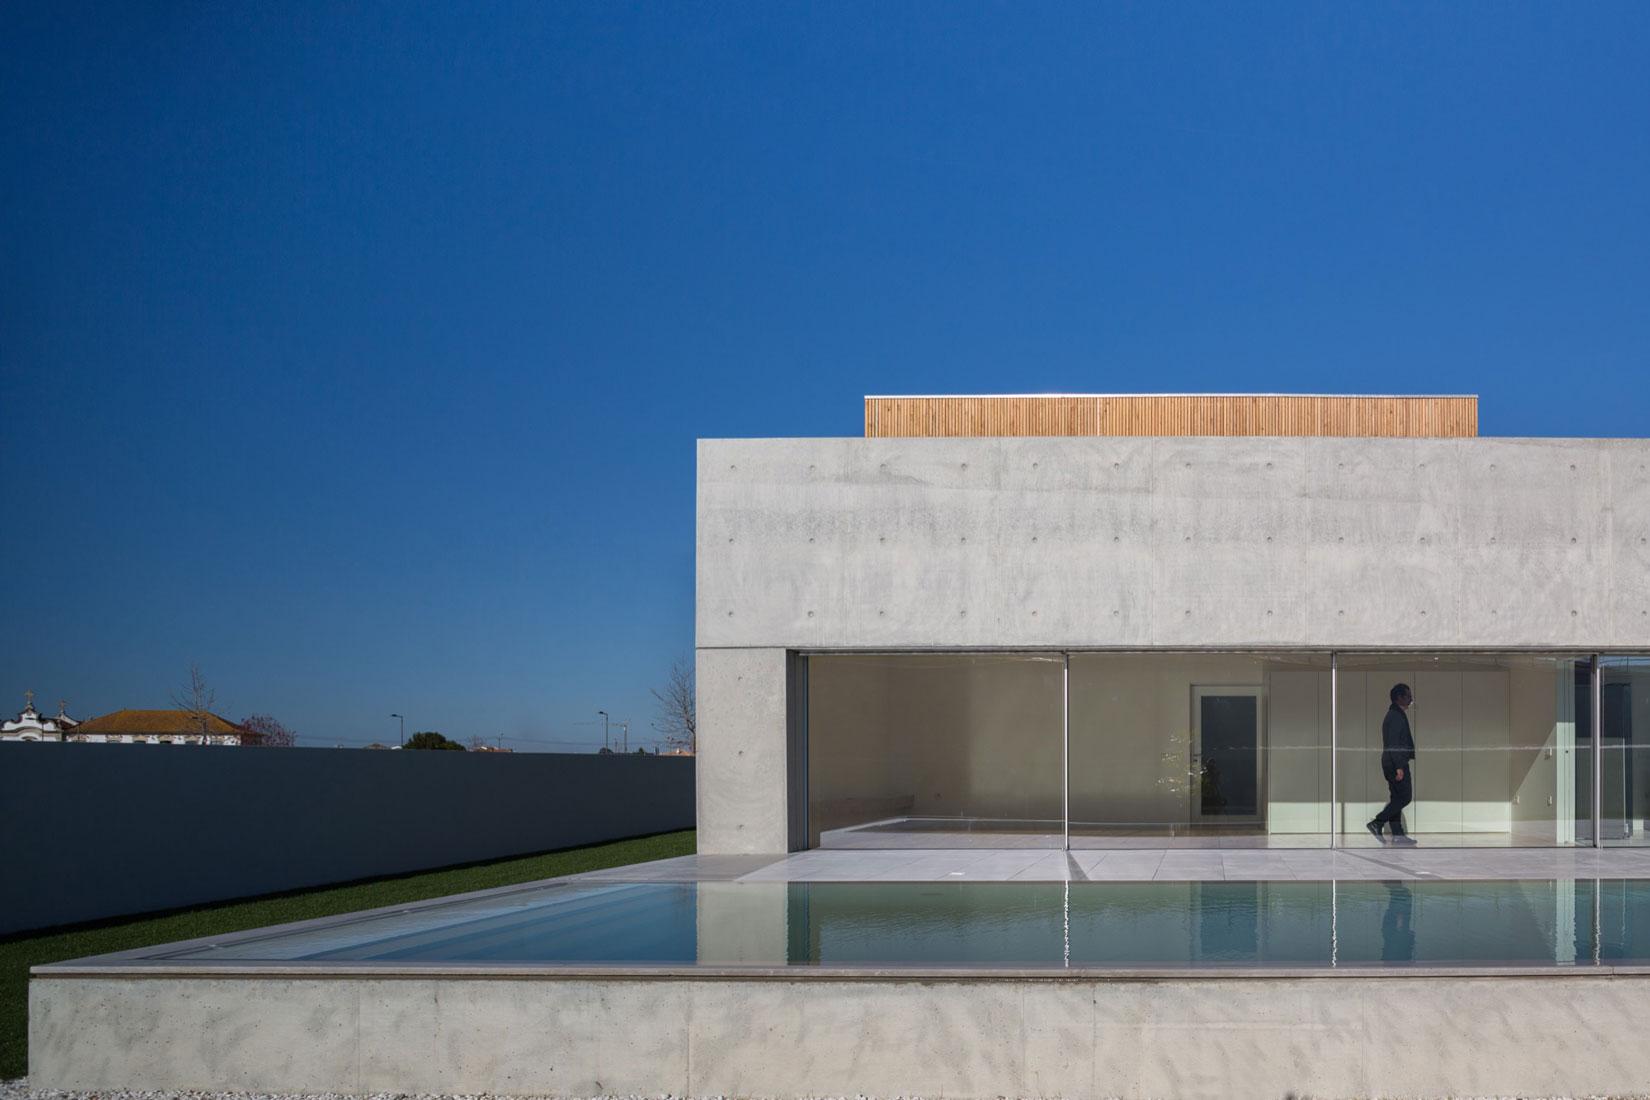 arquitectura minimalista la casa de avanca minimalismo xyz